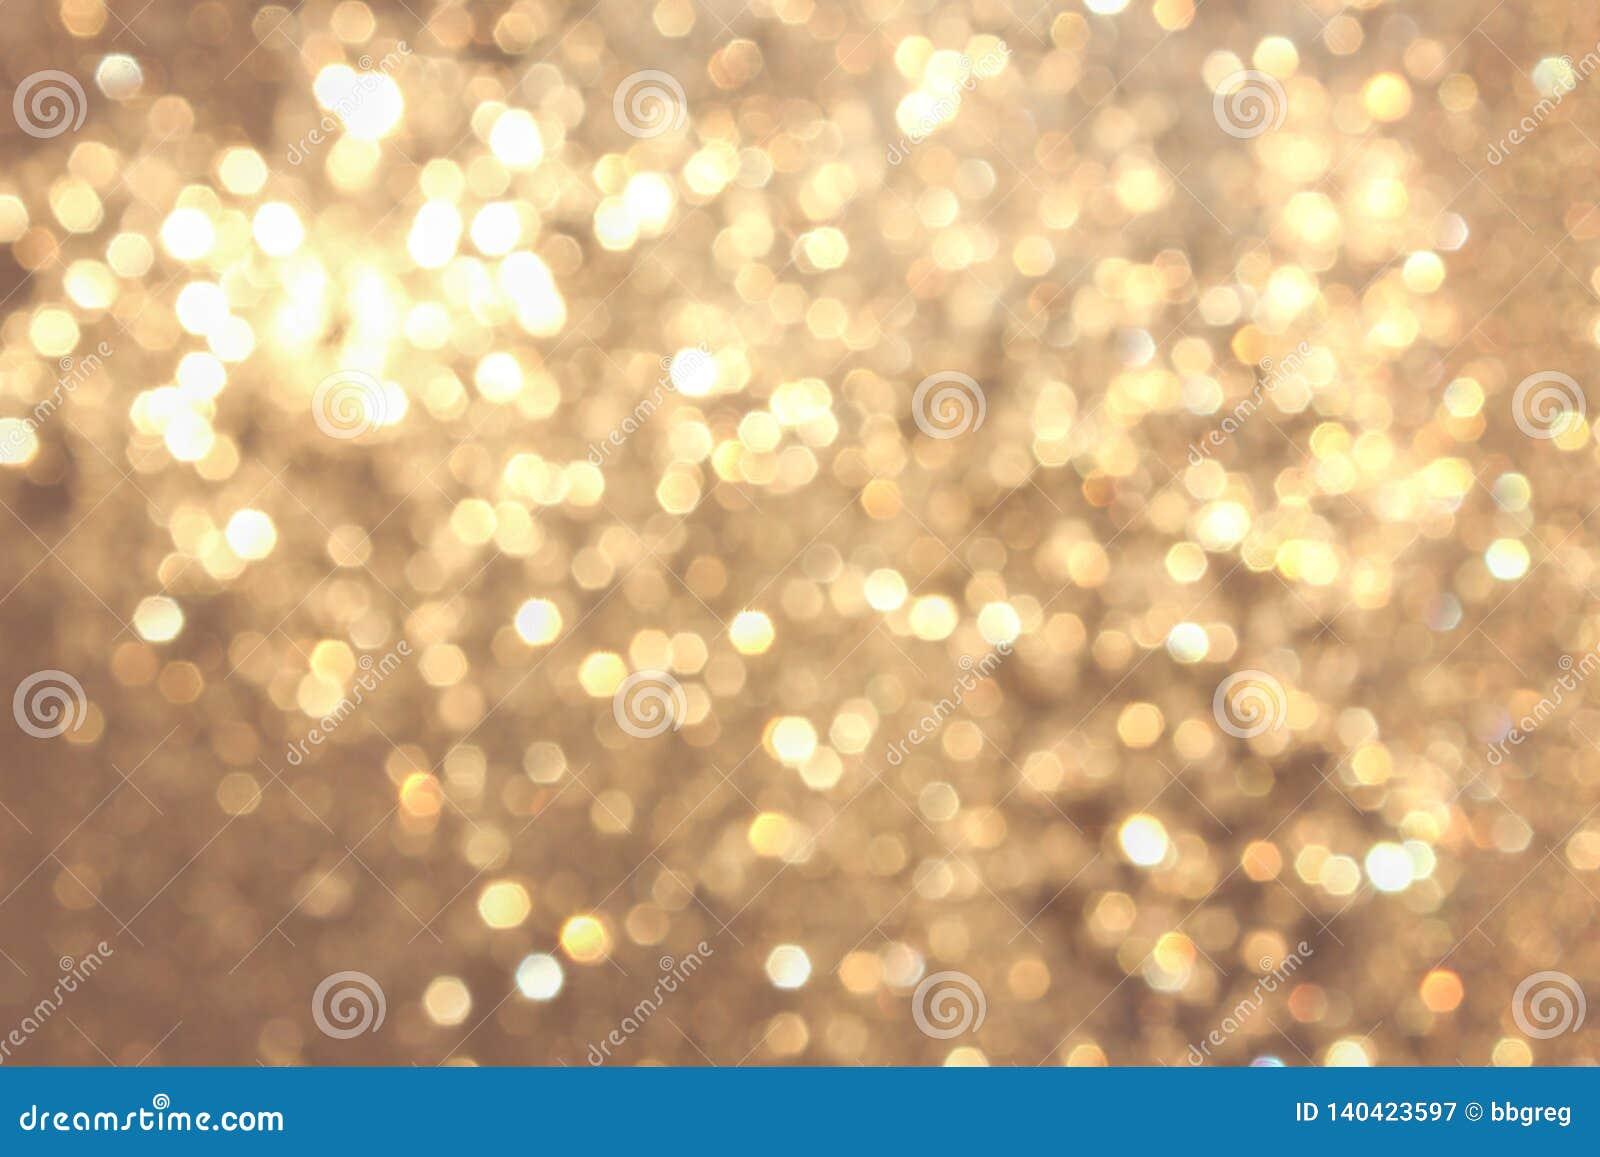 Bokeh vívido amarelo dourado no estilo macio da cor, fundo blured, cartão